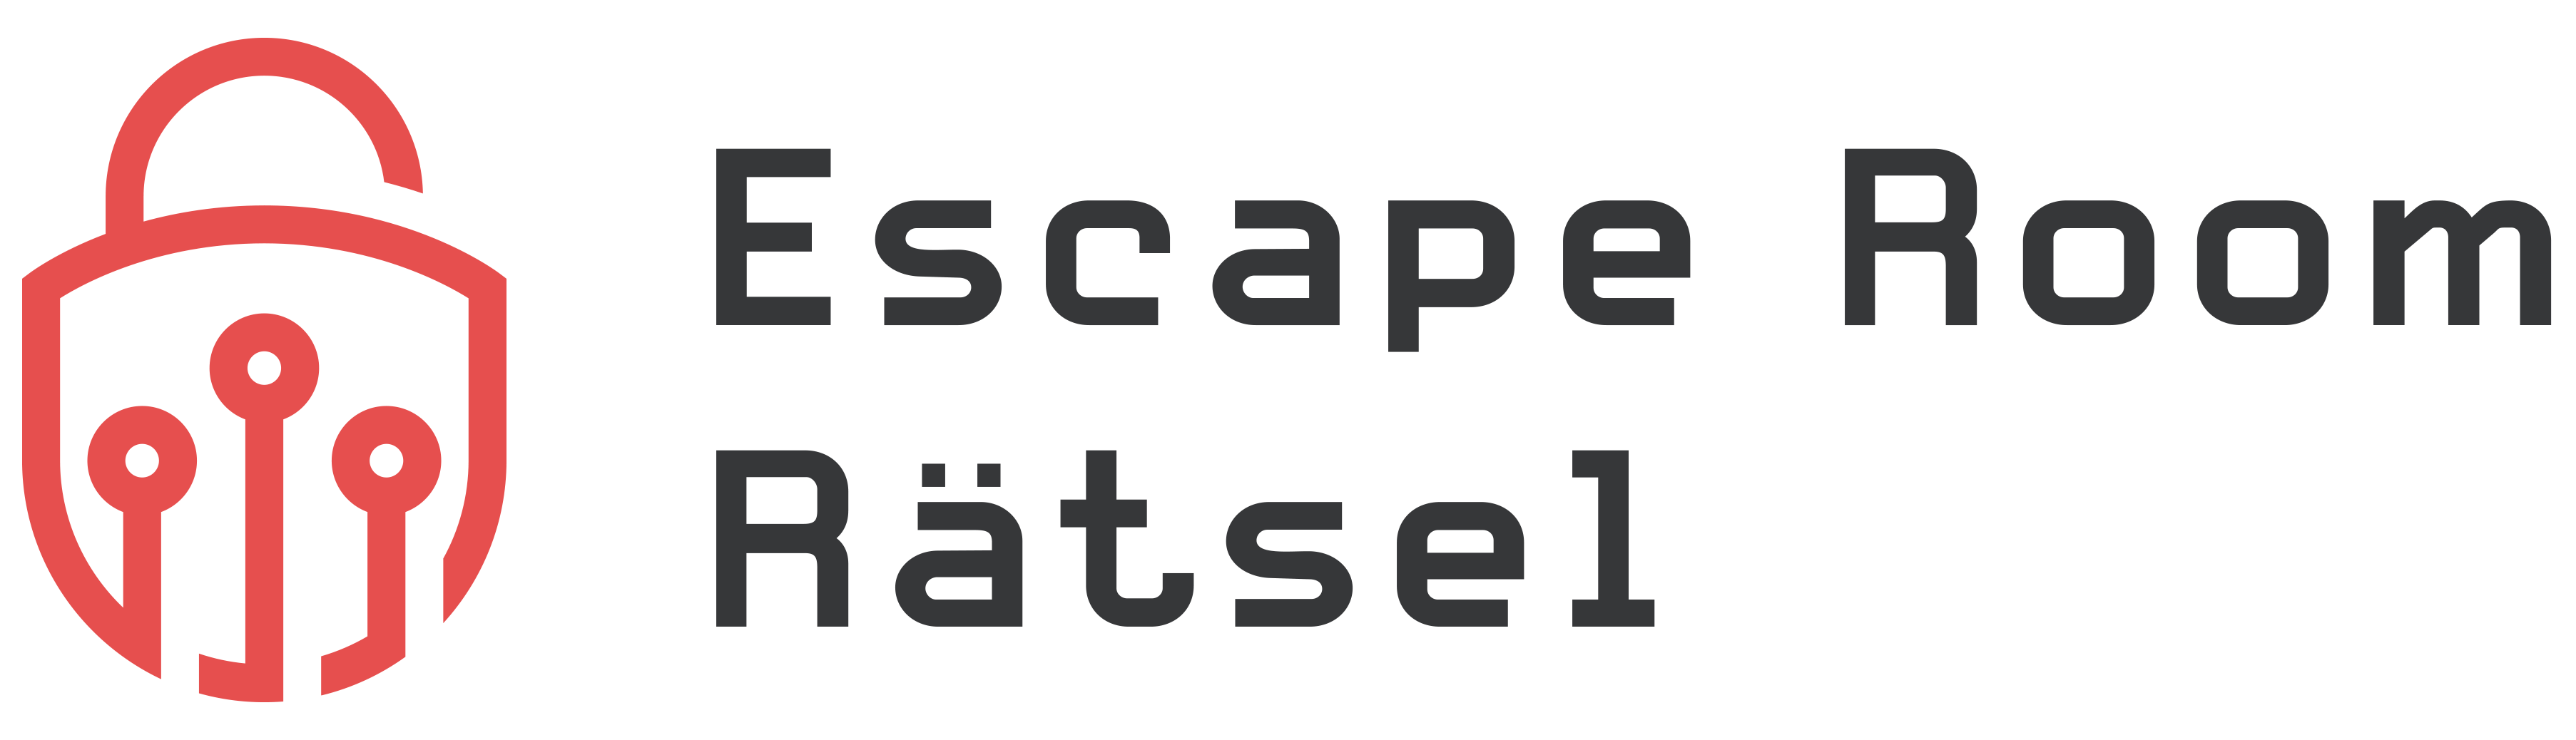 Escape Room Rätsel